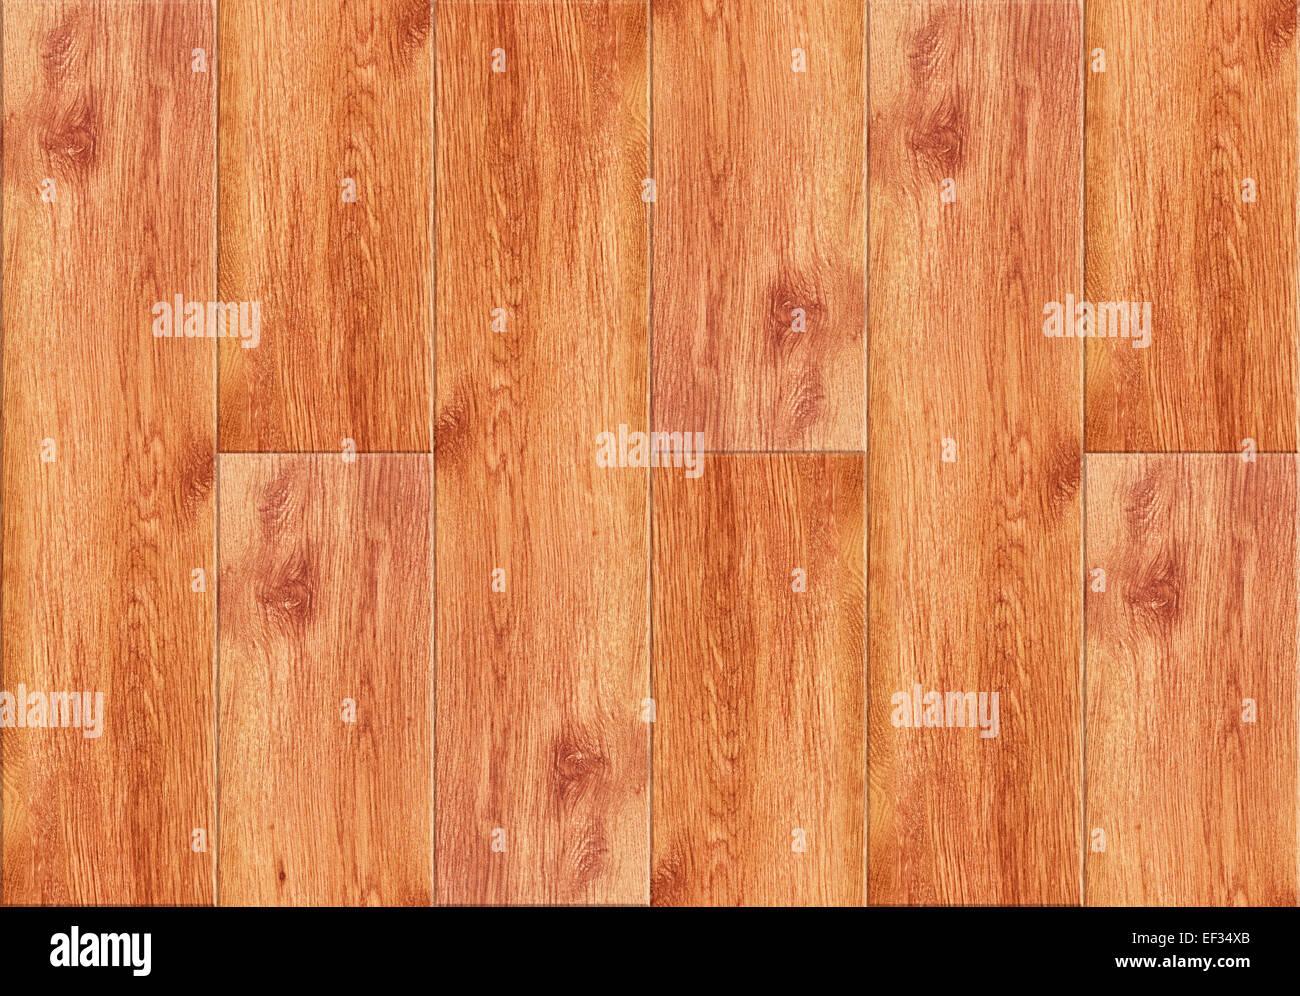 Nahtlose Holz Laminatboden Texturmuster Als Interior Design Hintergrund  Stockbild